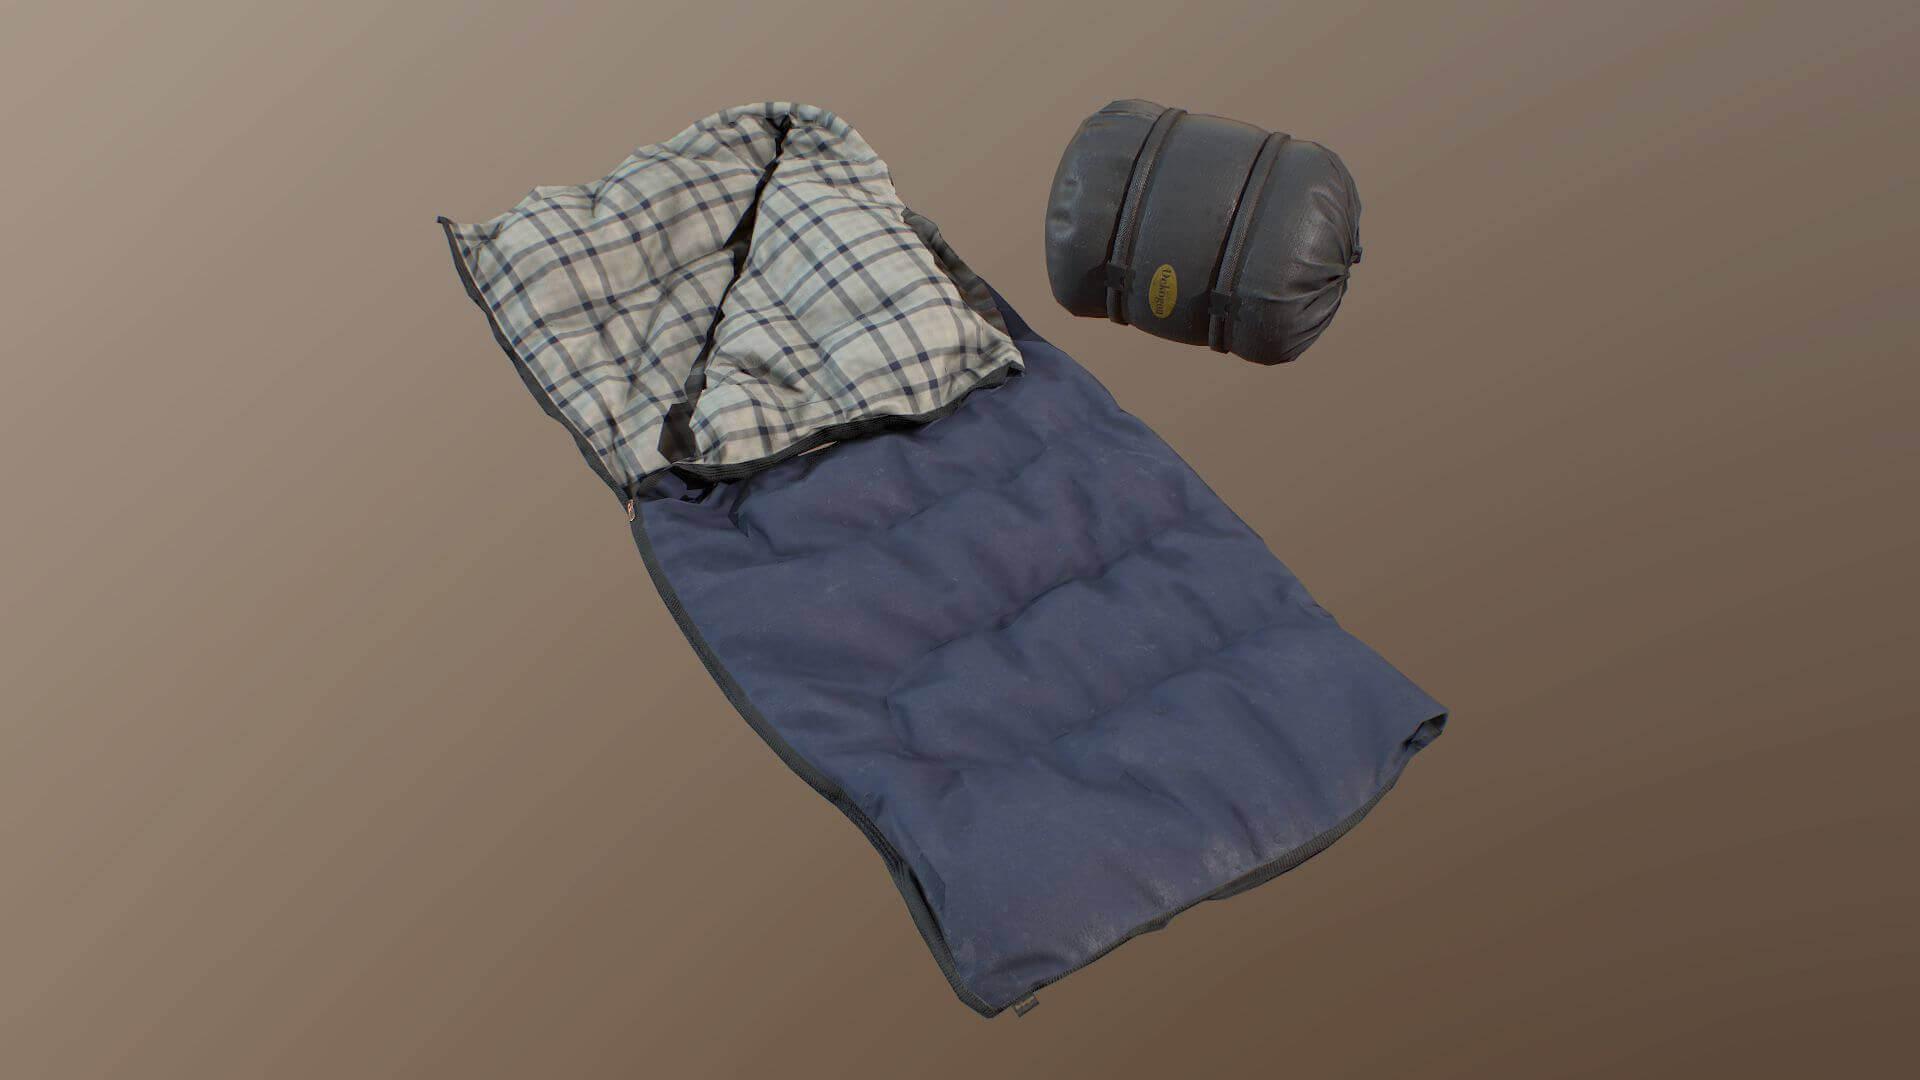 Sleeping Bag Blue 3d Model